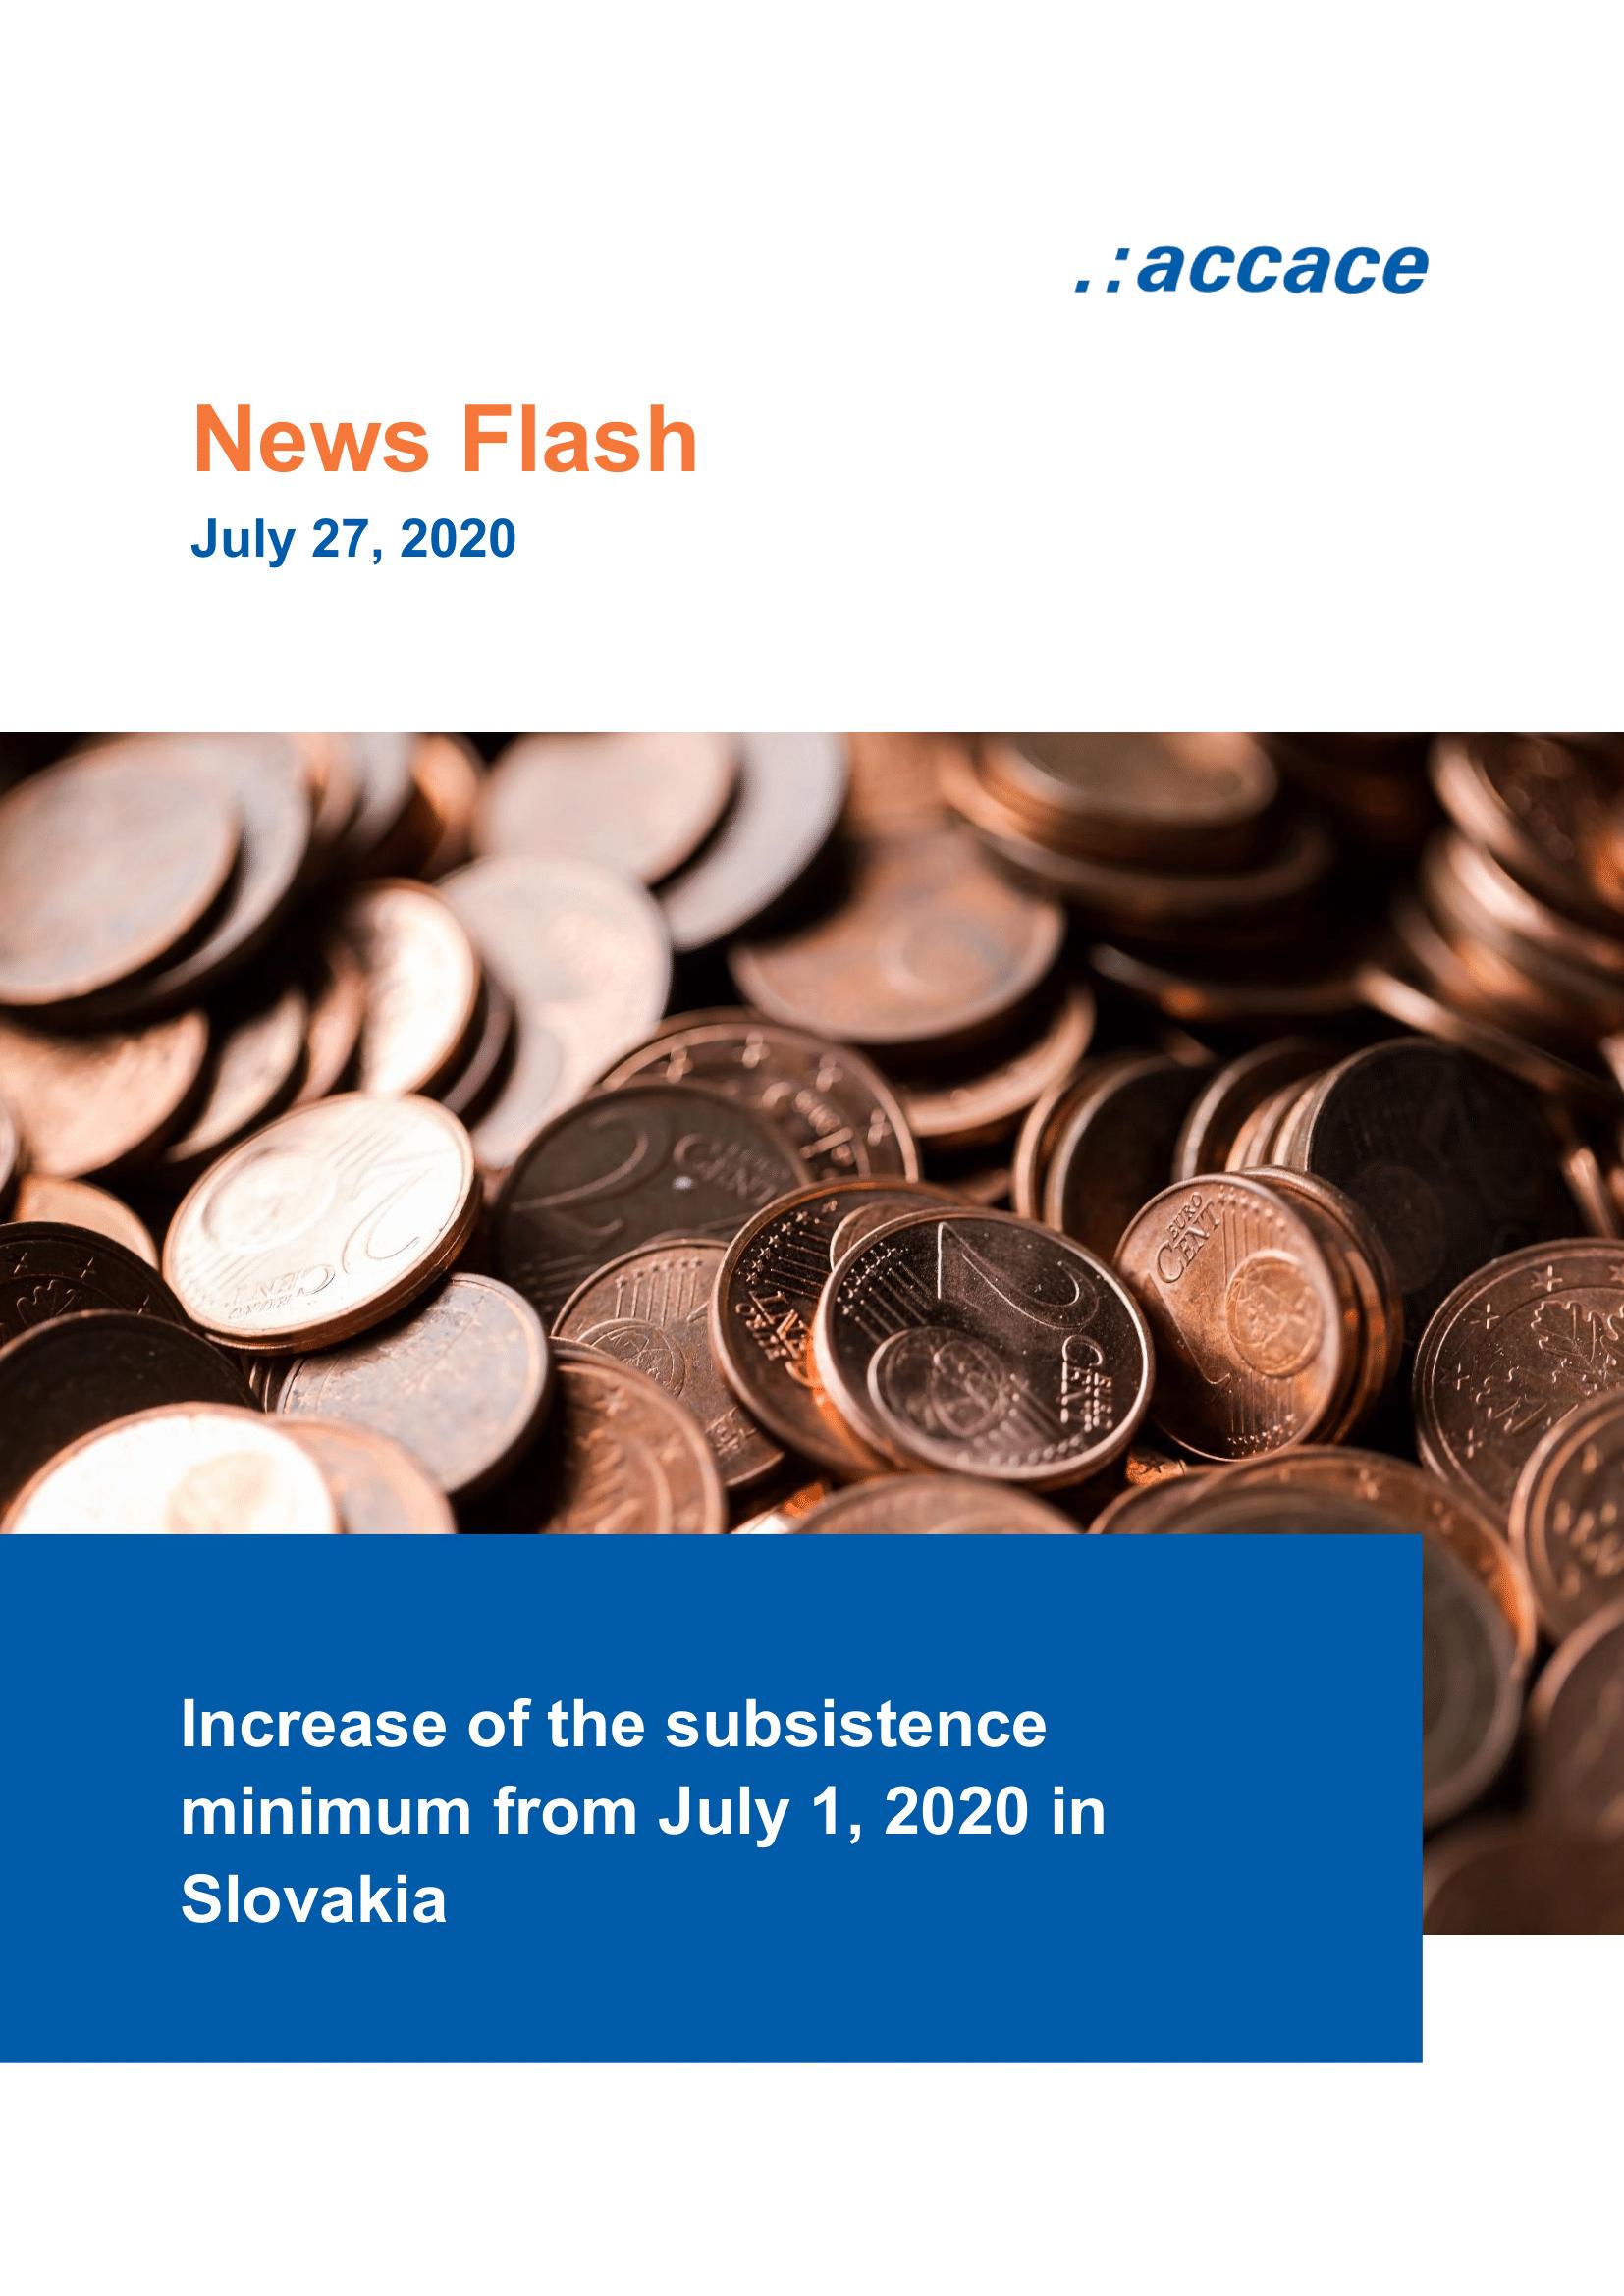 NEWS FLASH-2020-07-27_Increase of the subsistence minimum_EN